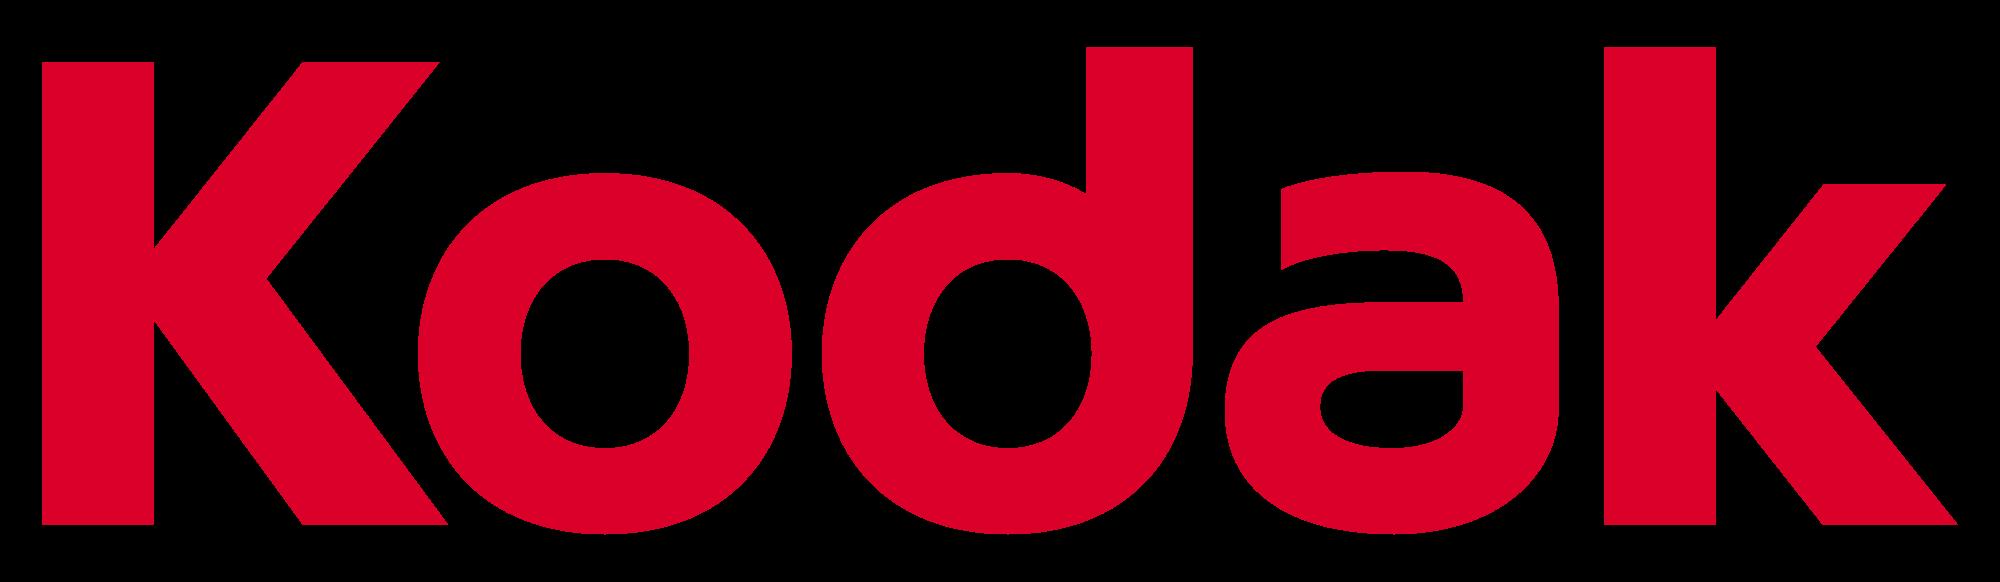 Kodak Black Developer 1041870, 1041-870